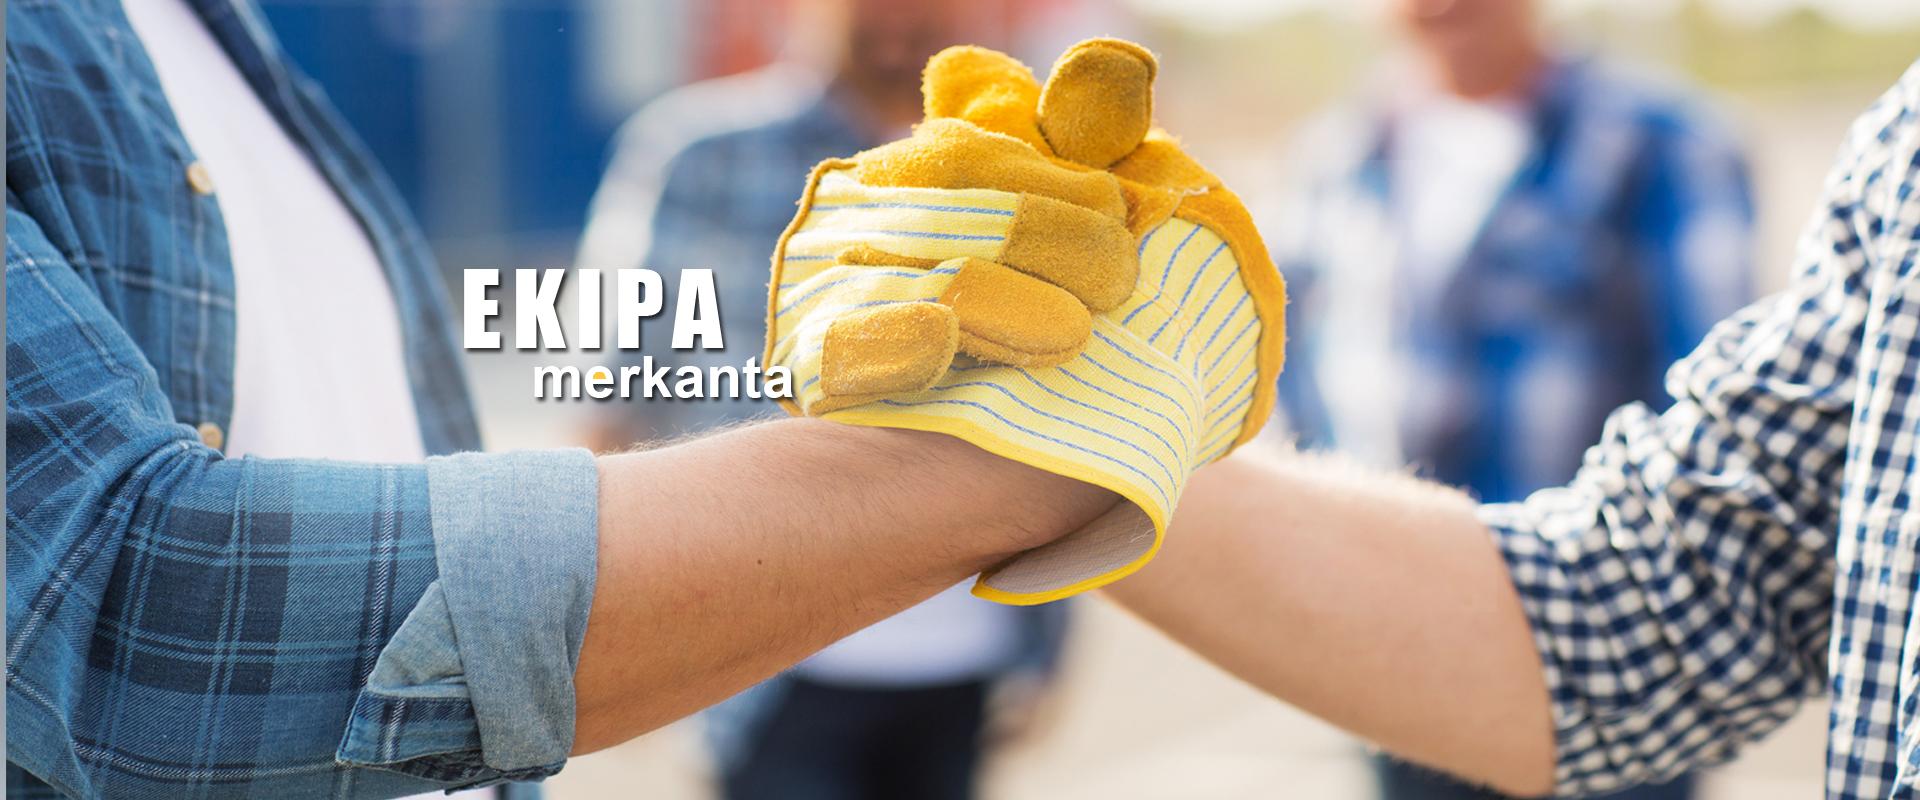 ekipa_merkanta kopia